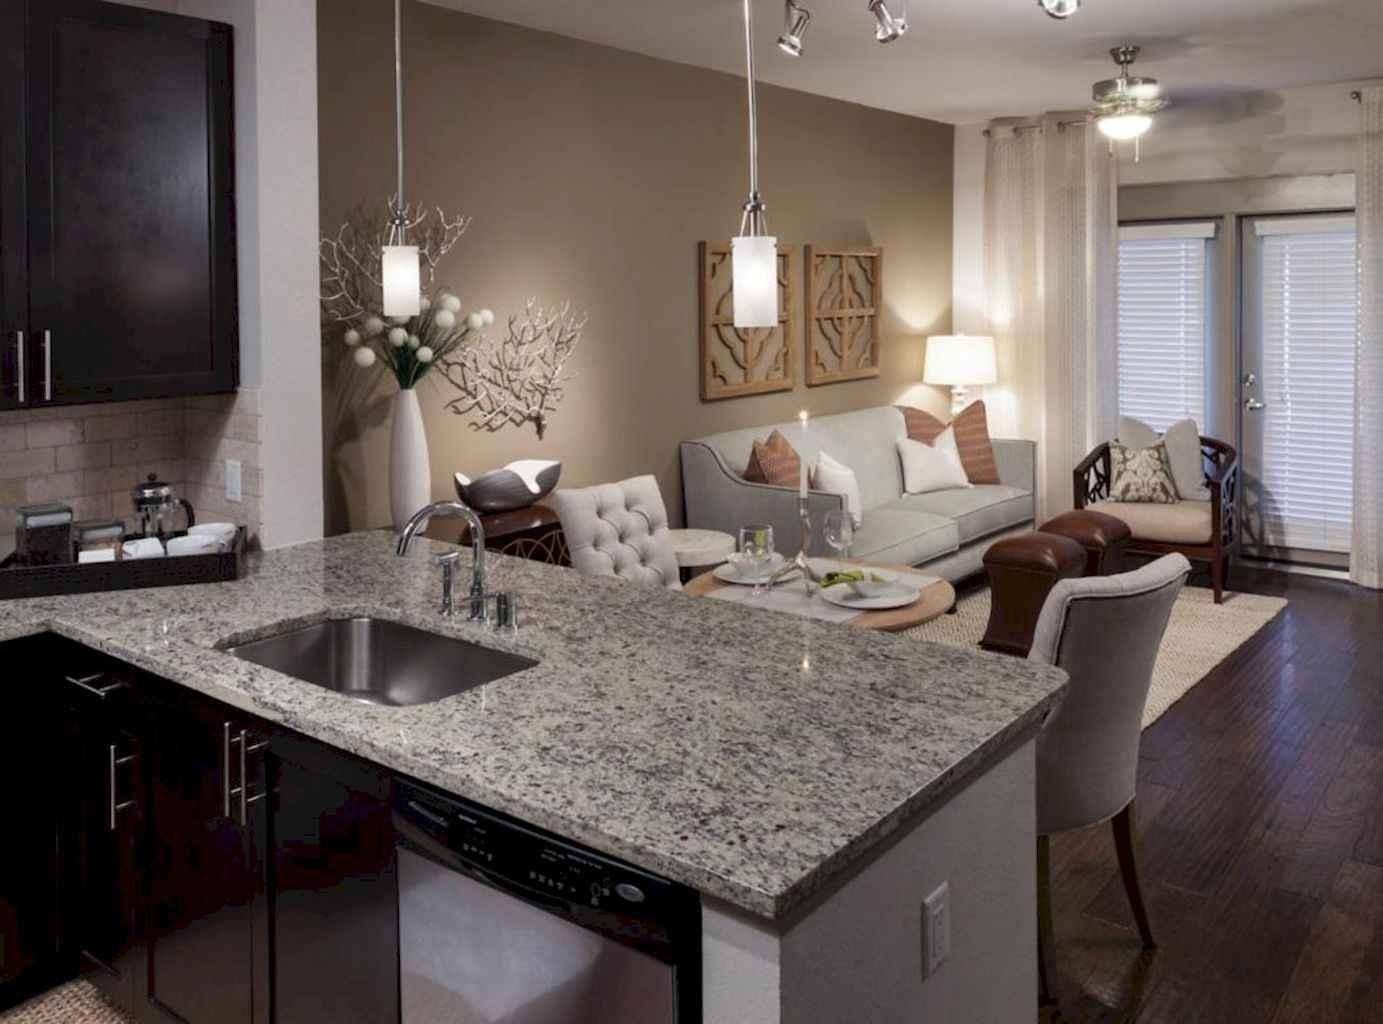 Small apartment decorating ideas (79)